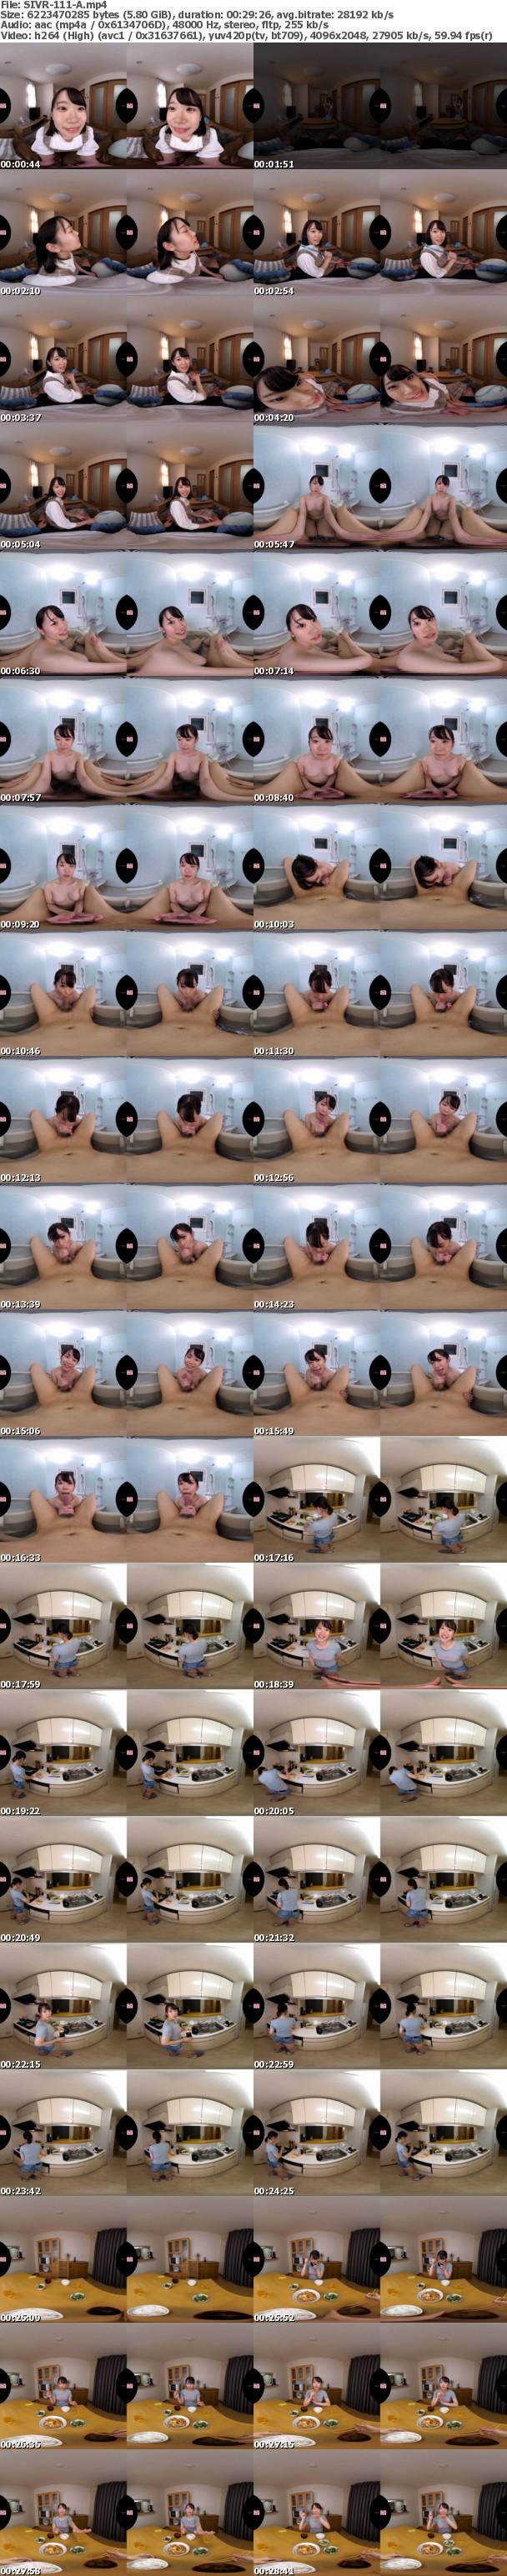 (VR) SIVR-111 架乃ゆらを完全独占!人気AV女優が僕だけに見せる素顔&イキ顔 最高の密着距離でひたすらSEXに没頭する究極同棲VR